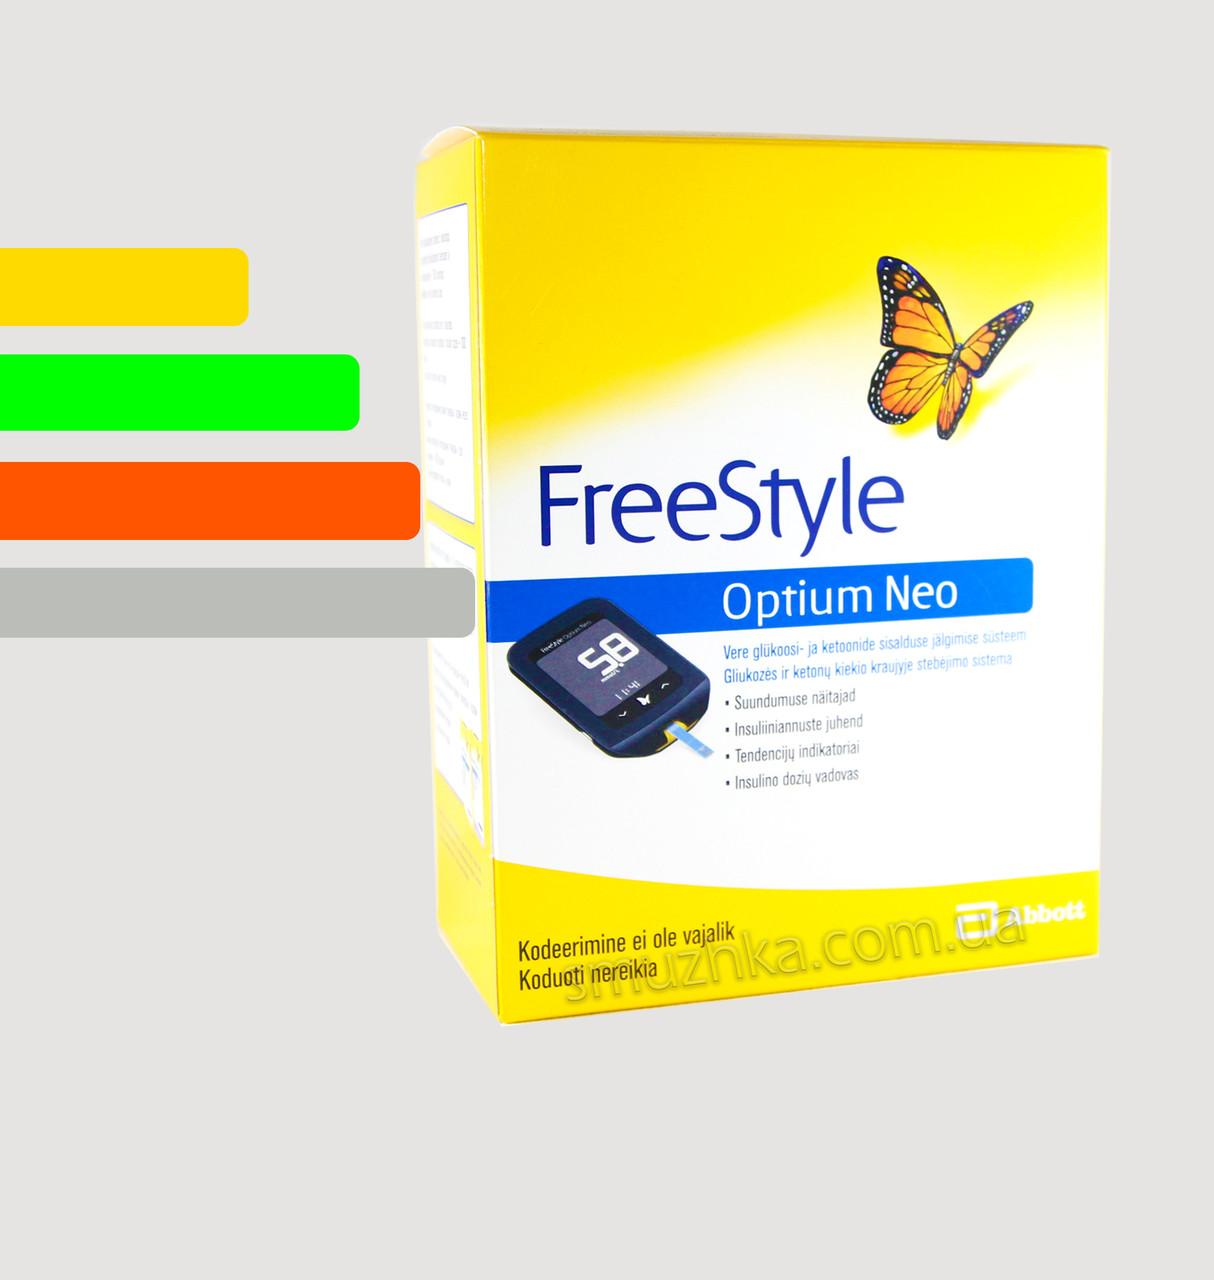 Глюкометр Freestyle Optium Neo - Фристайл Оптиум Нео